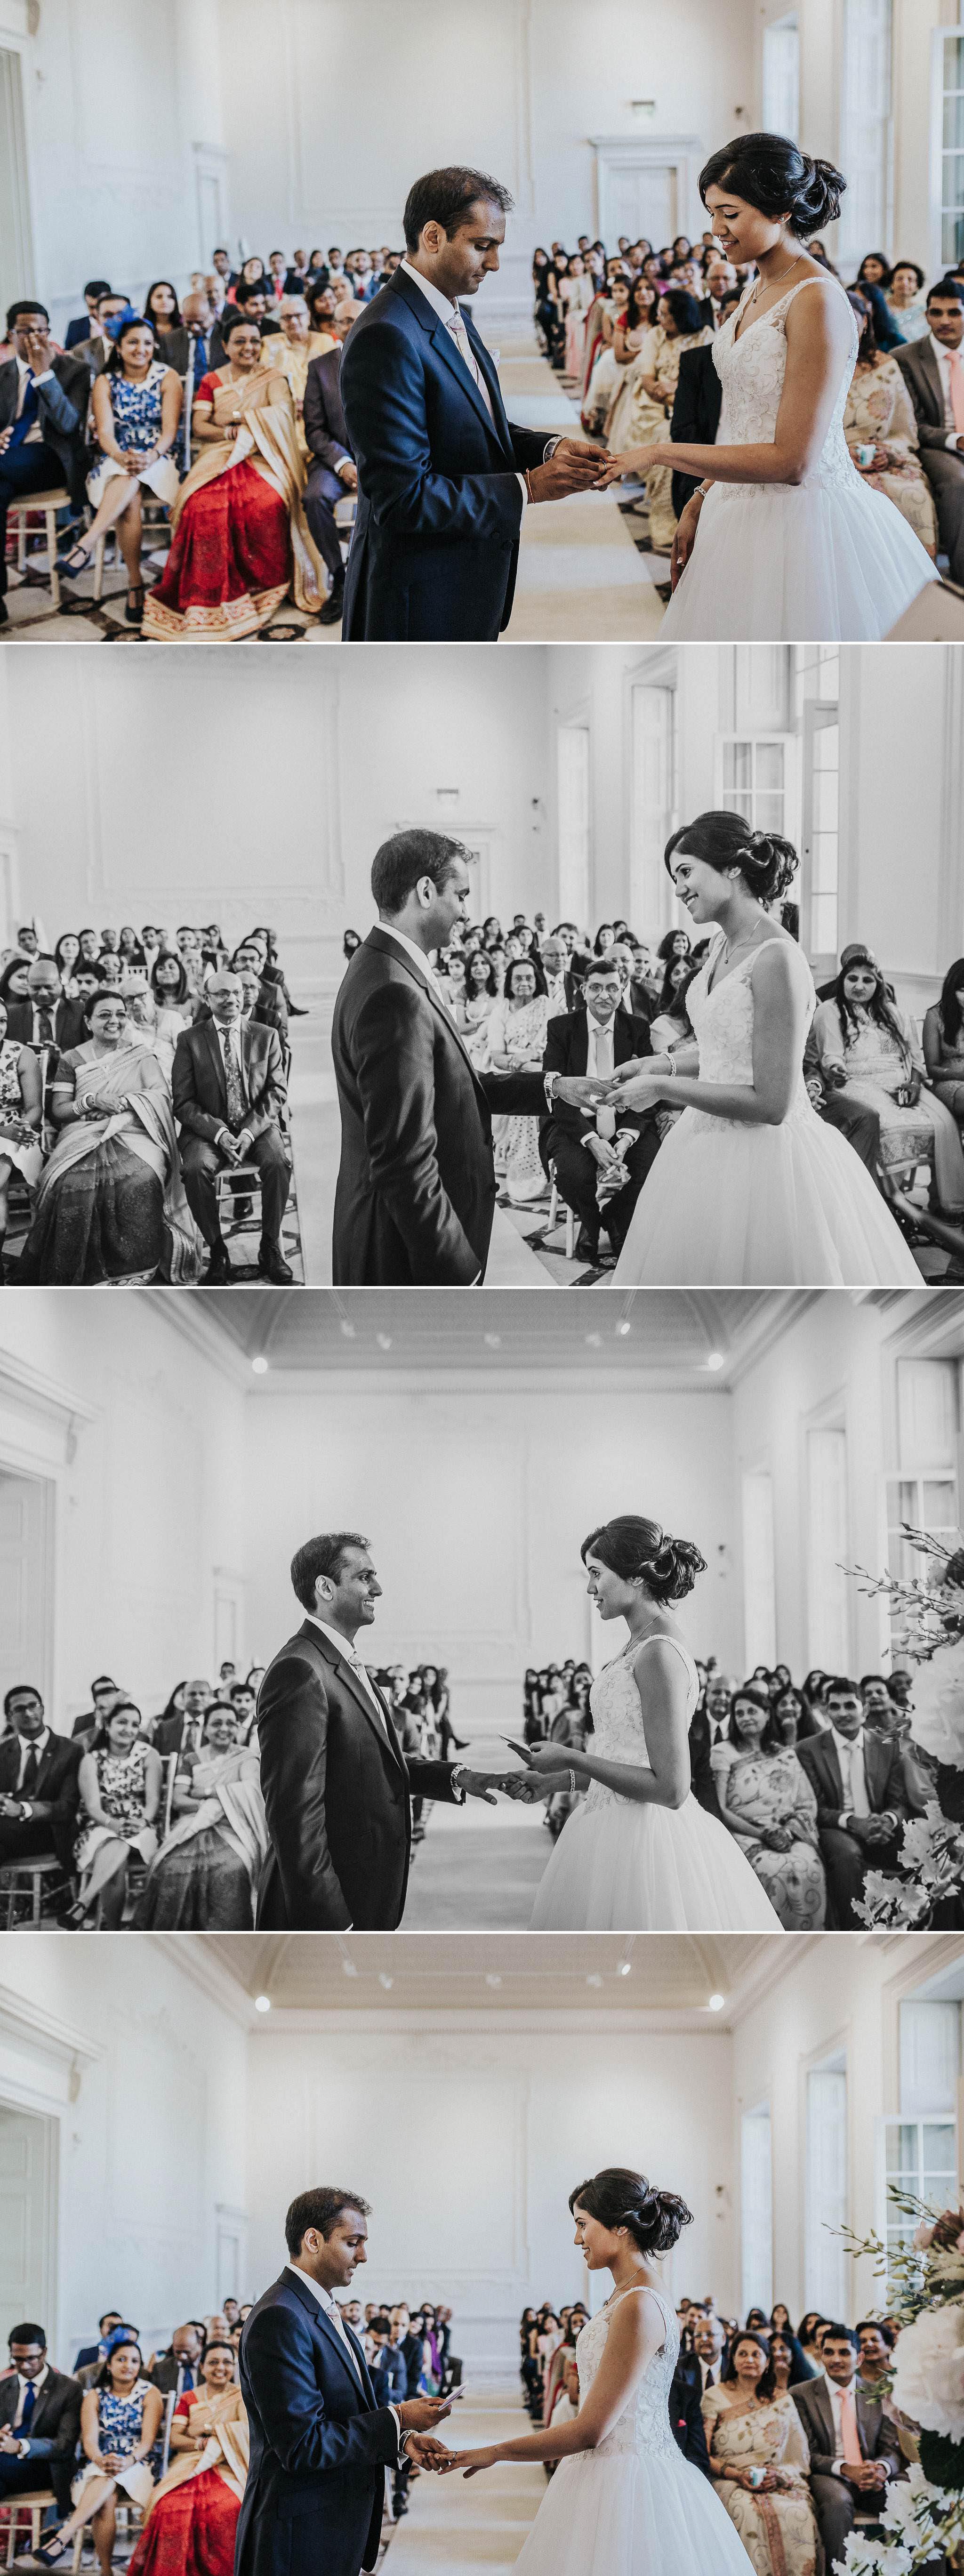 compton-verney-wedding-photos+15.jpg